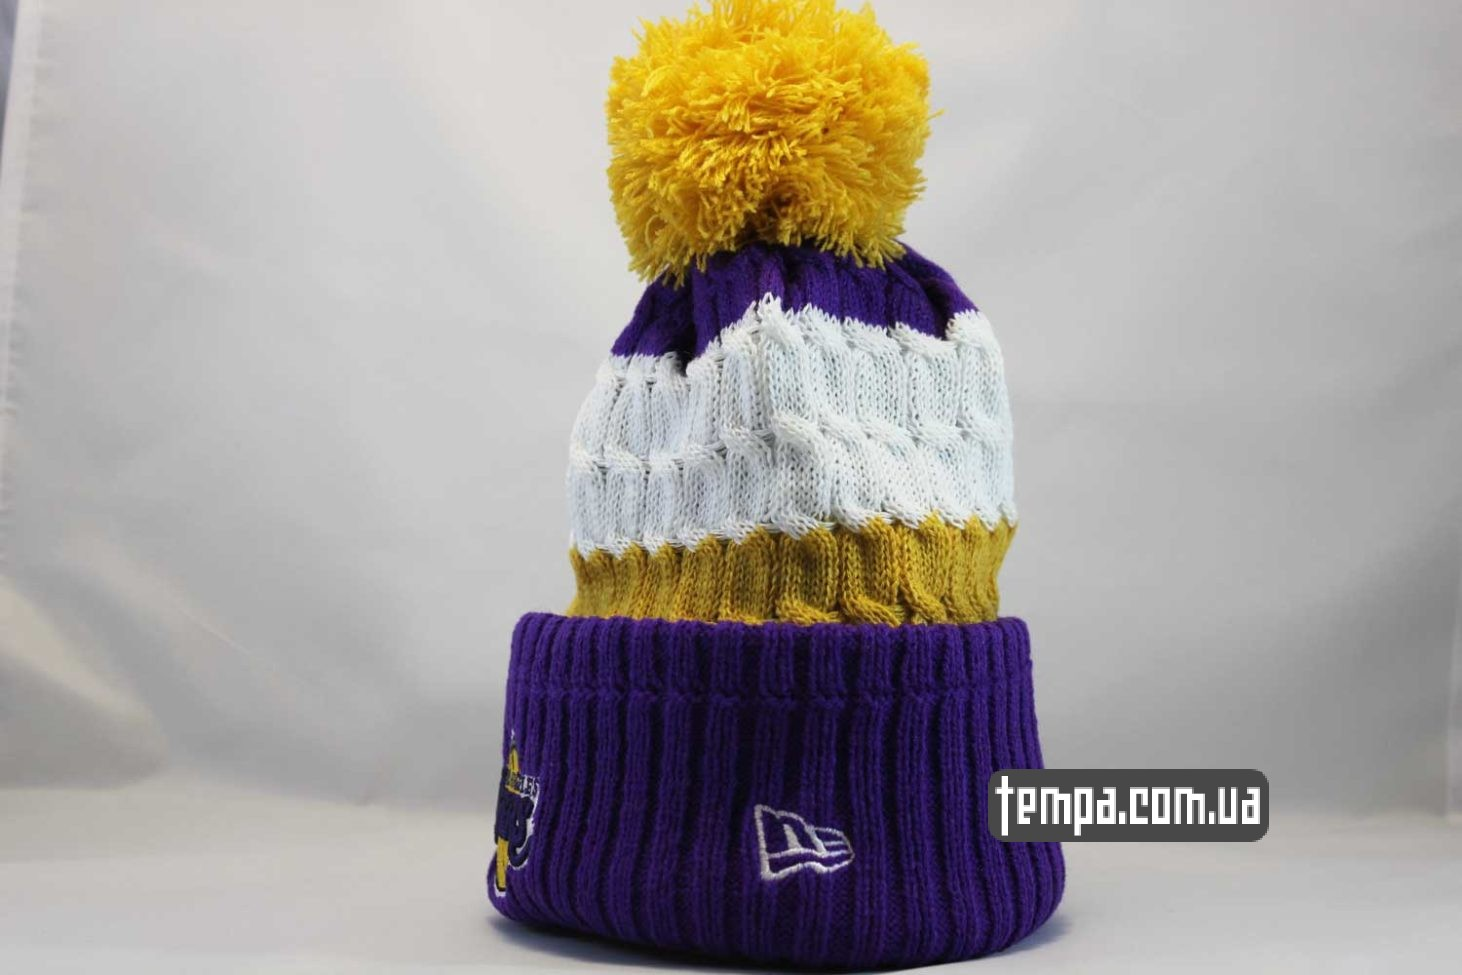 баскетбольбная одежда шапка beanie LAKERS Los Angeles NBA NewEra баскетбольная